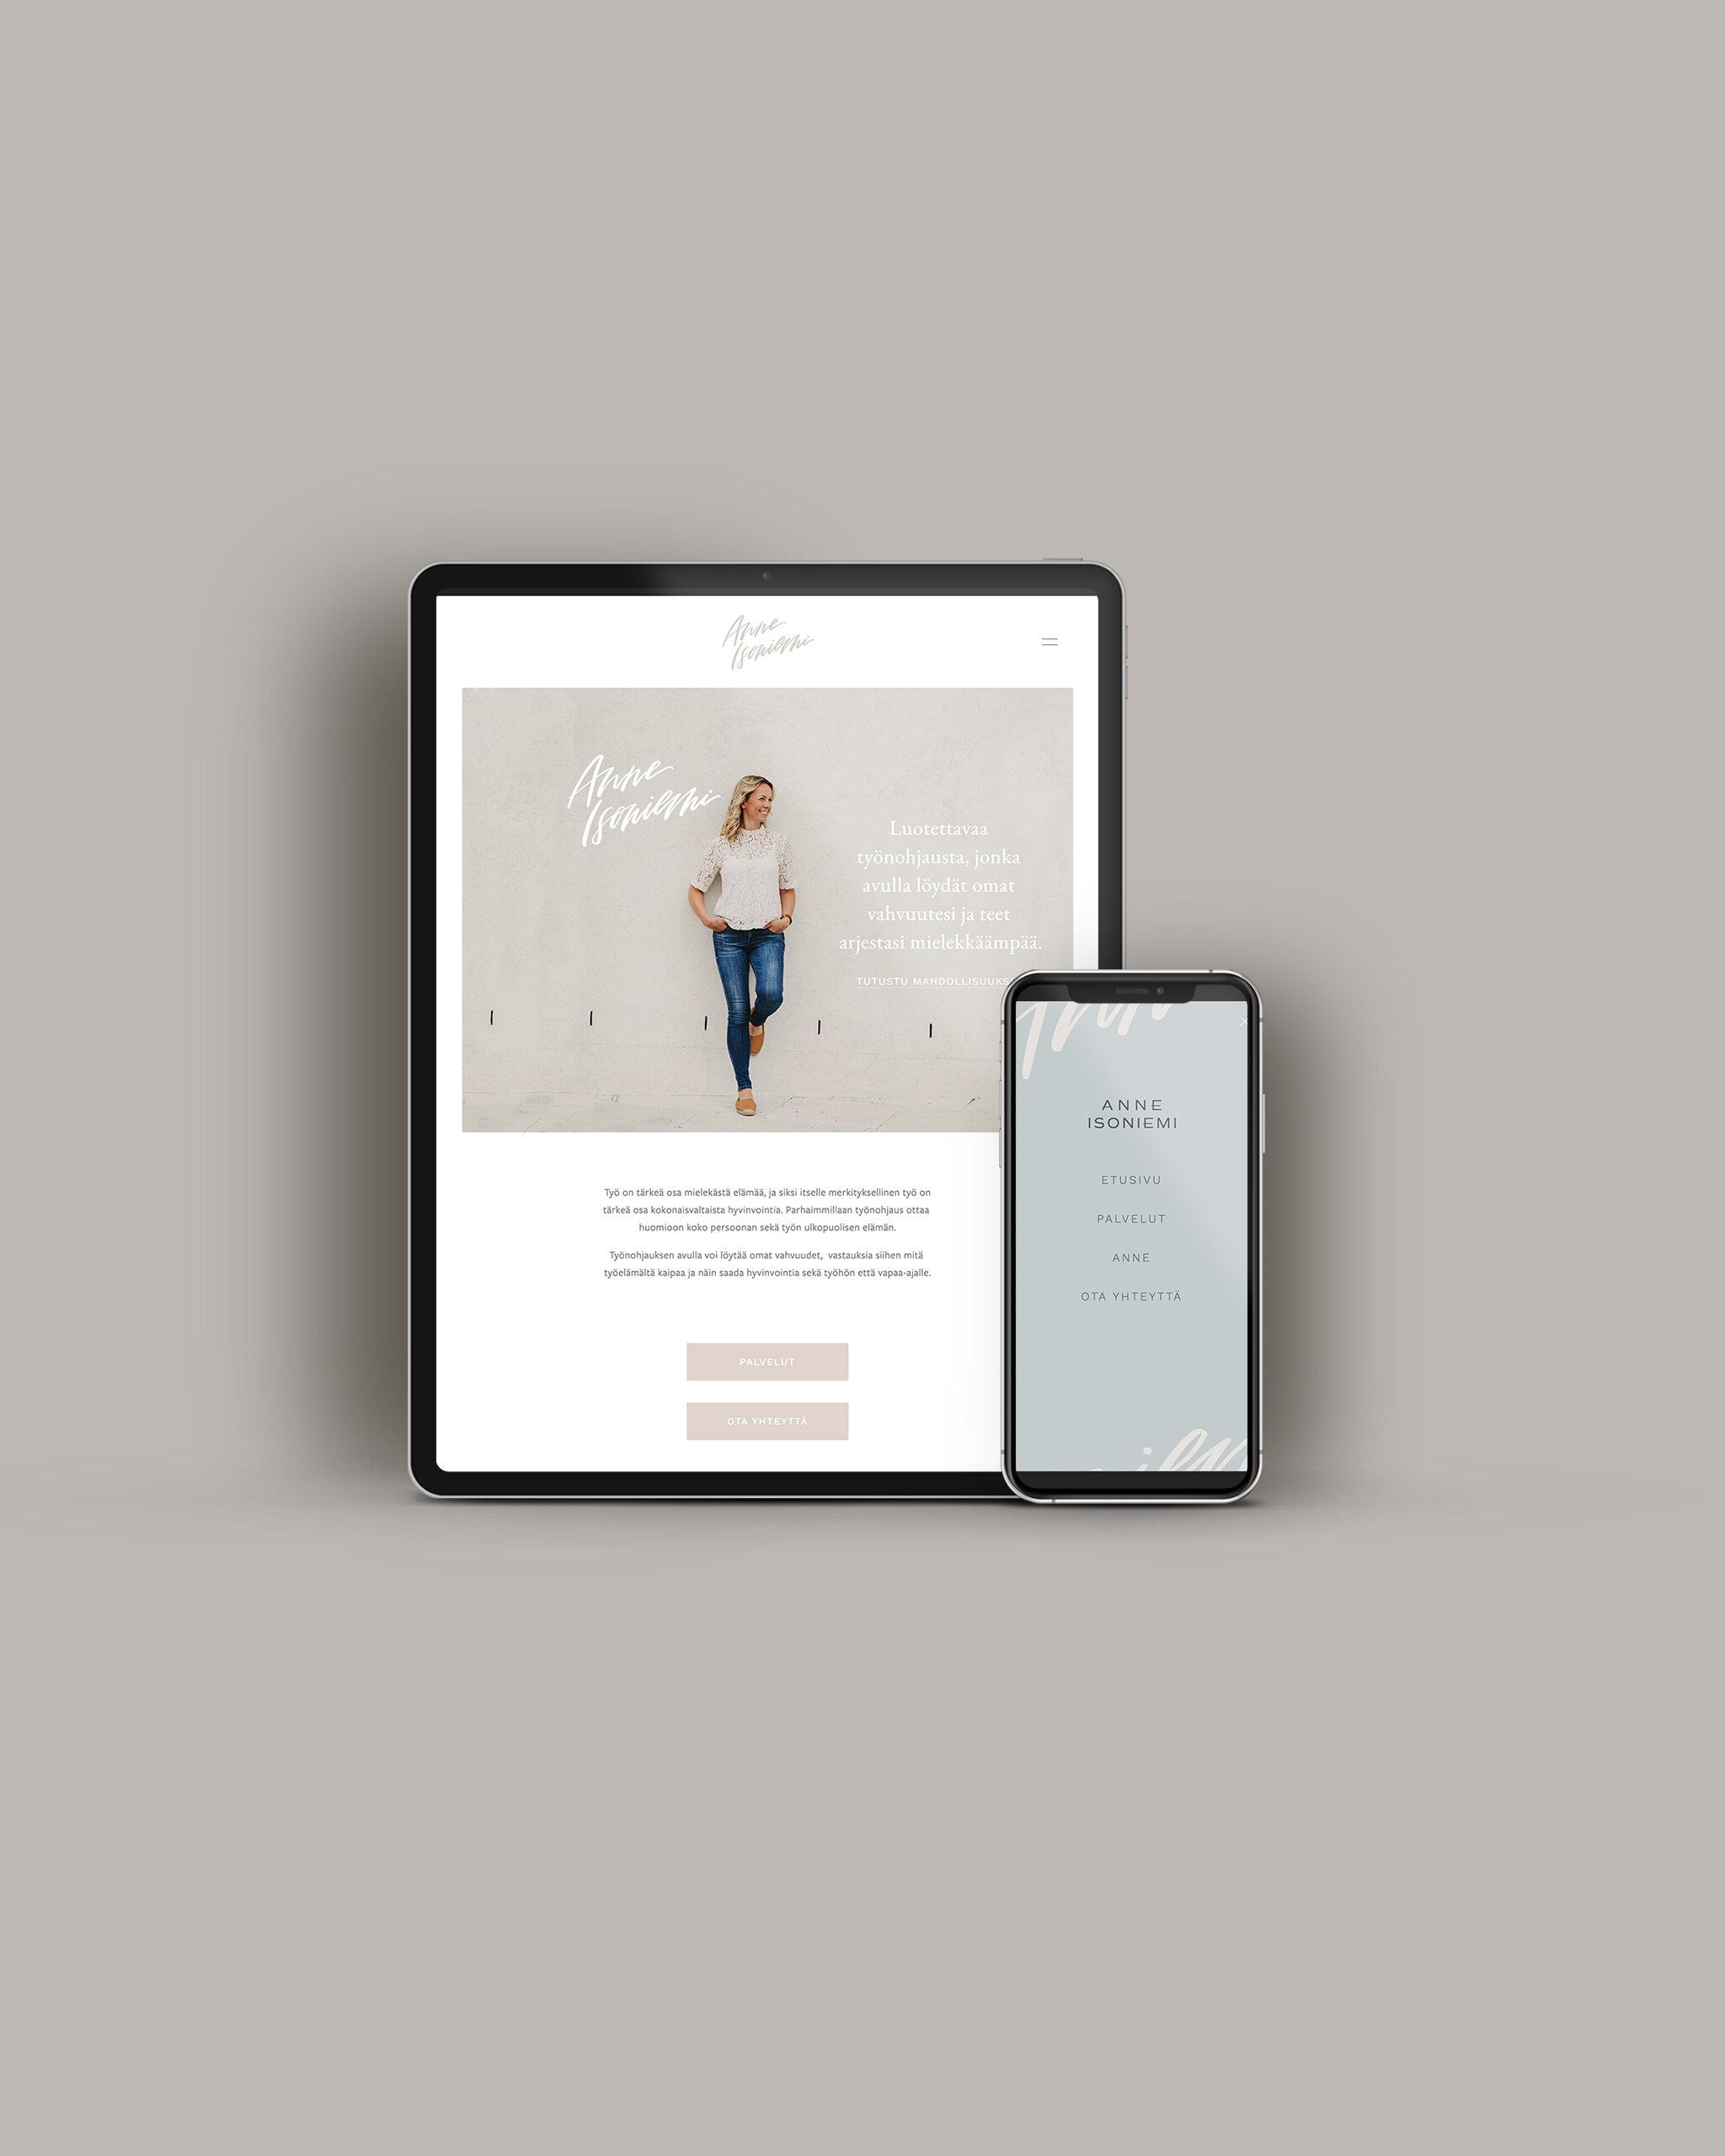 Riika-Tuohilampi-Design:Anne-Isoniemi-verkkosivut.jpg